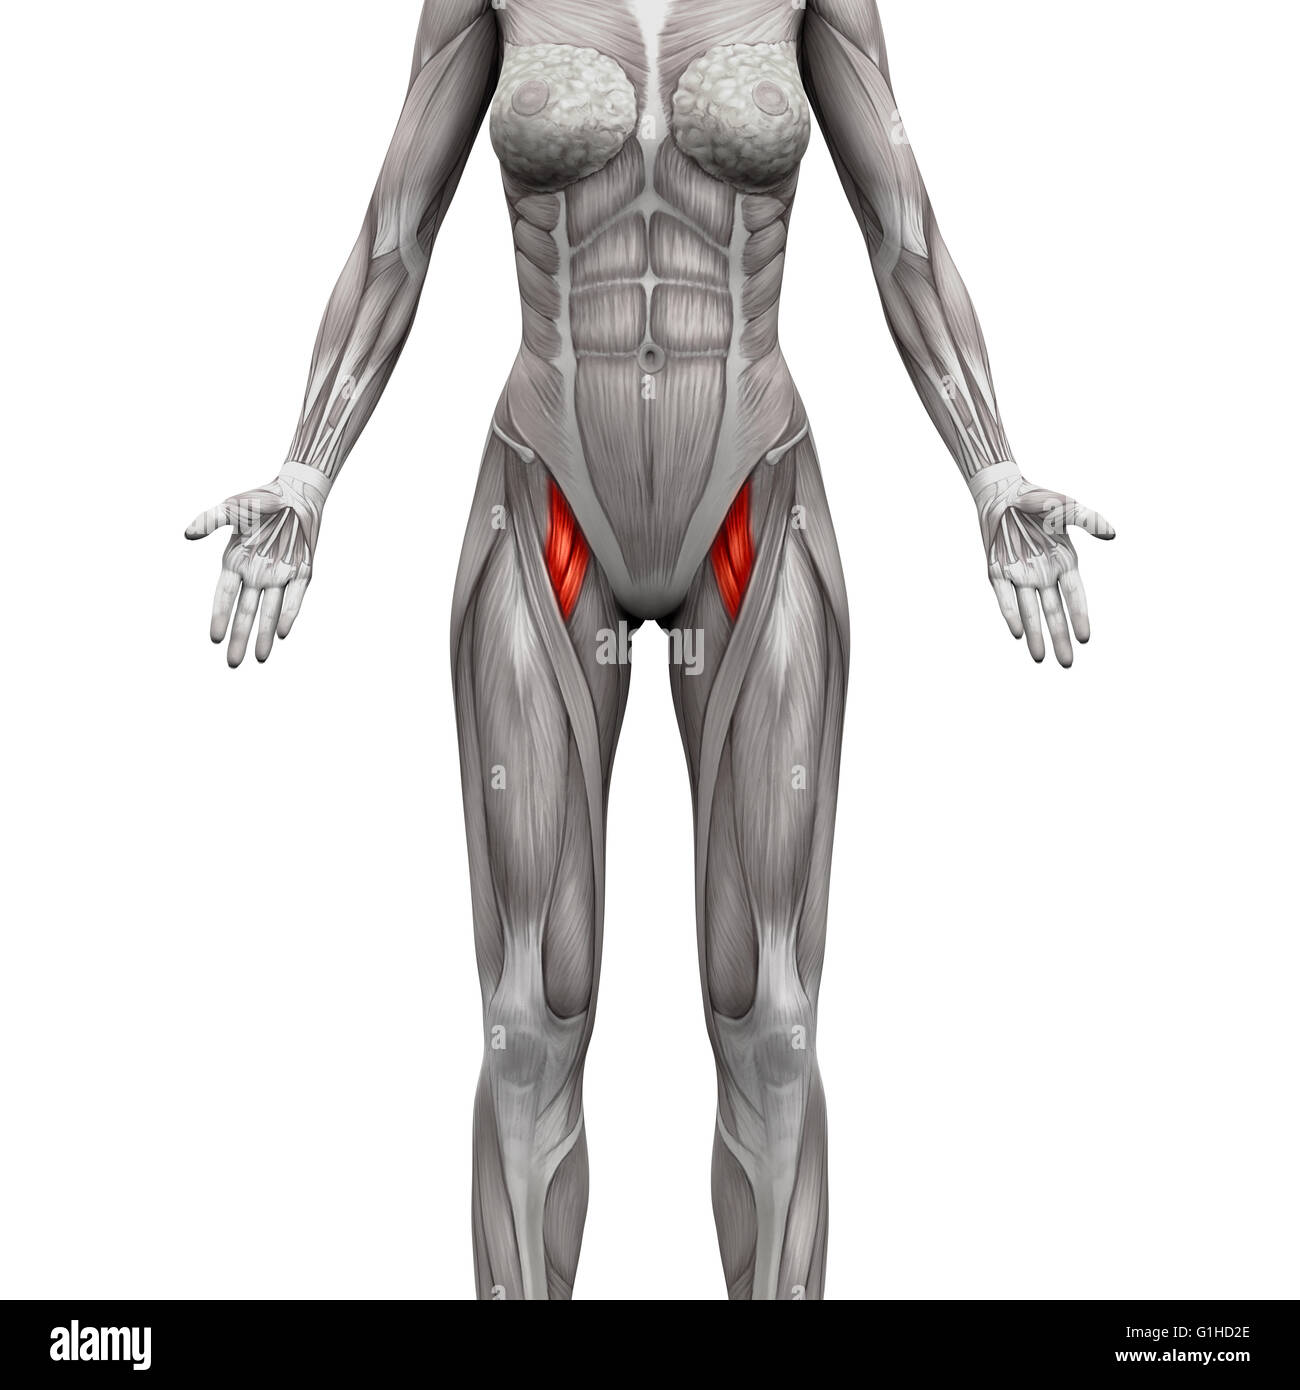 Adductor Brevis und Adductor Longus Muskel - Anatomie Muskeln ...